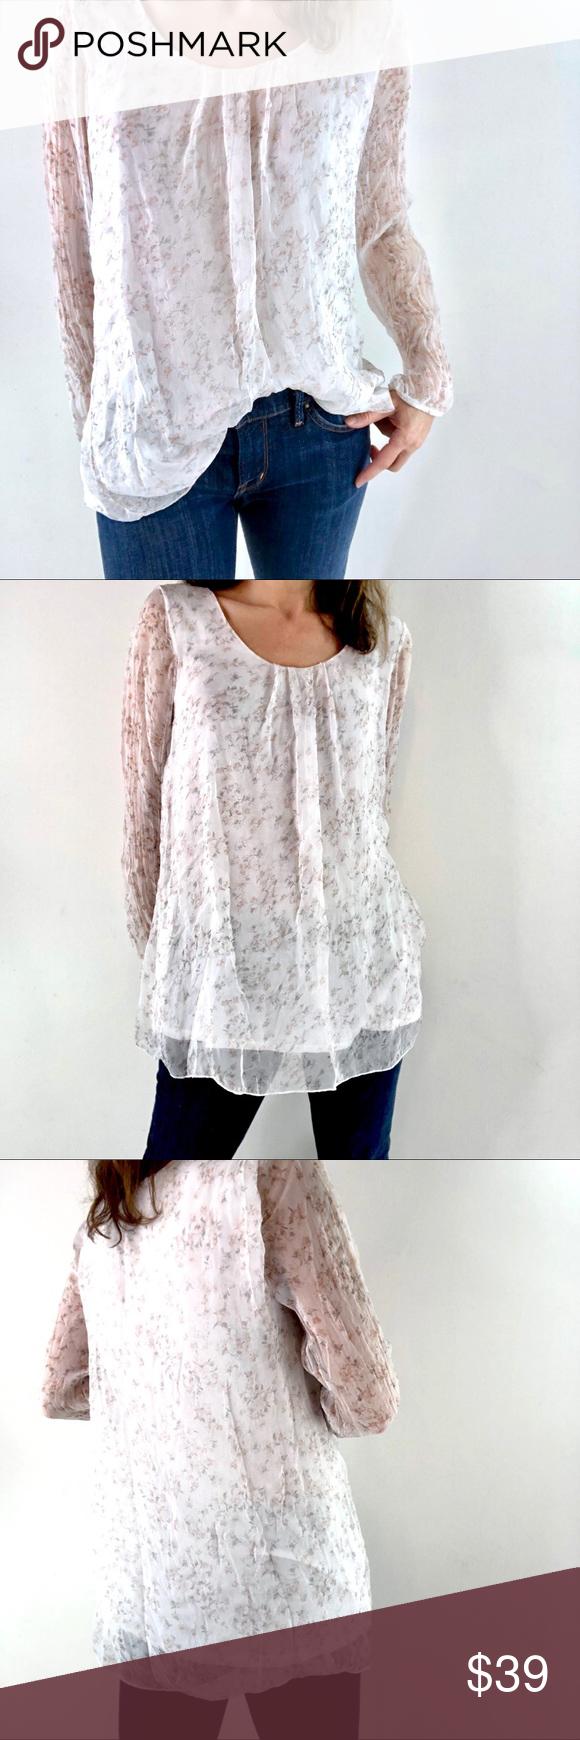 35c71b265be Italian Silk feminine top Sz L floral print blouse Brand  Piazza Del Tempio  made in